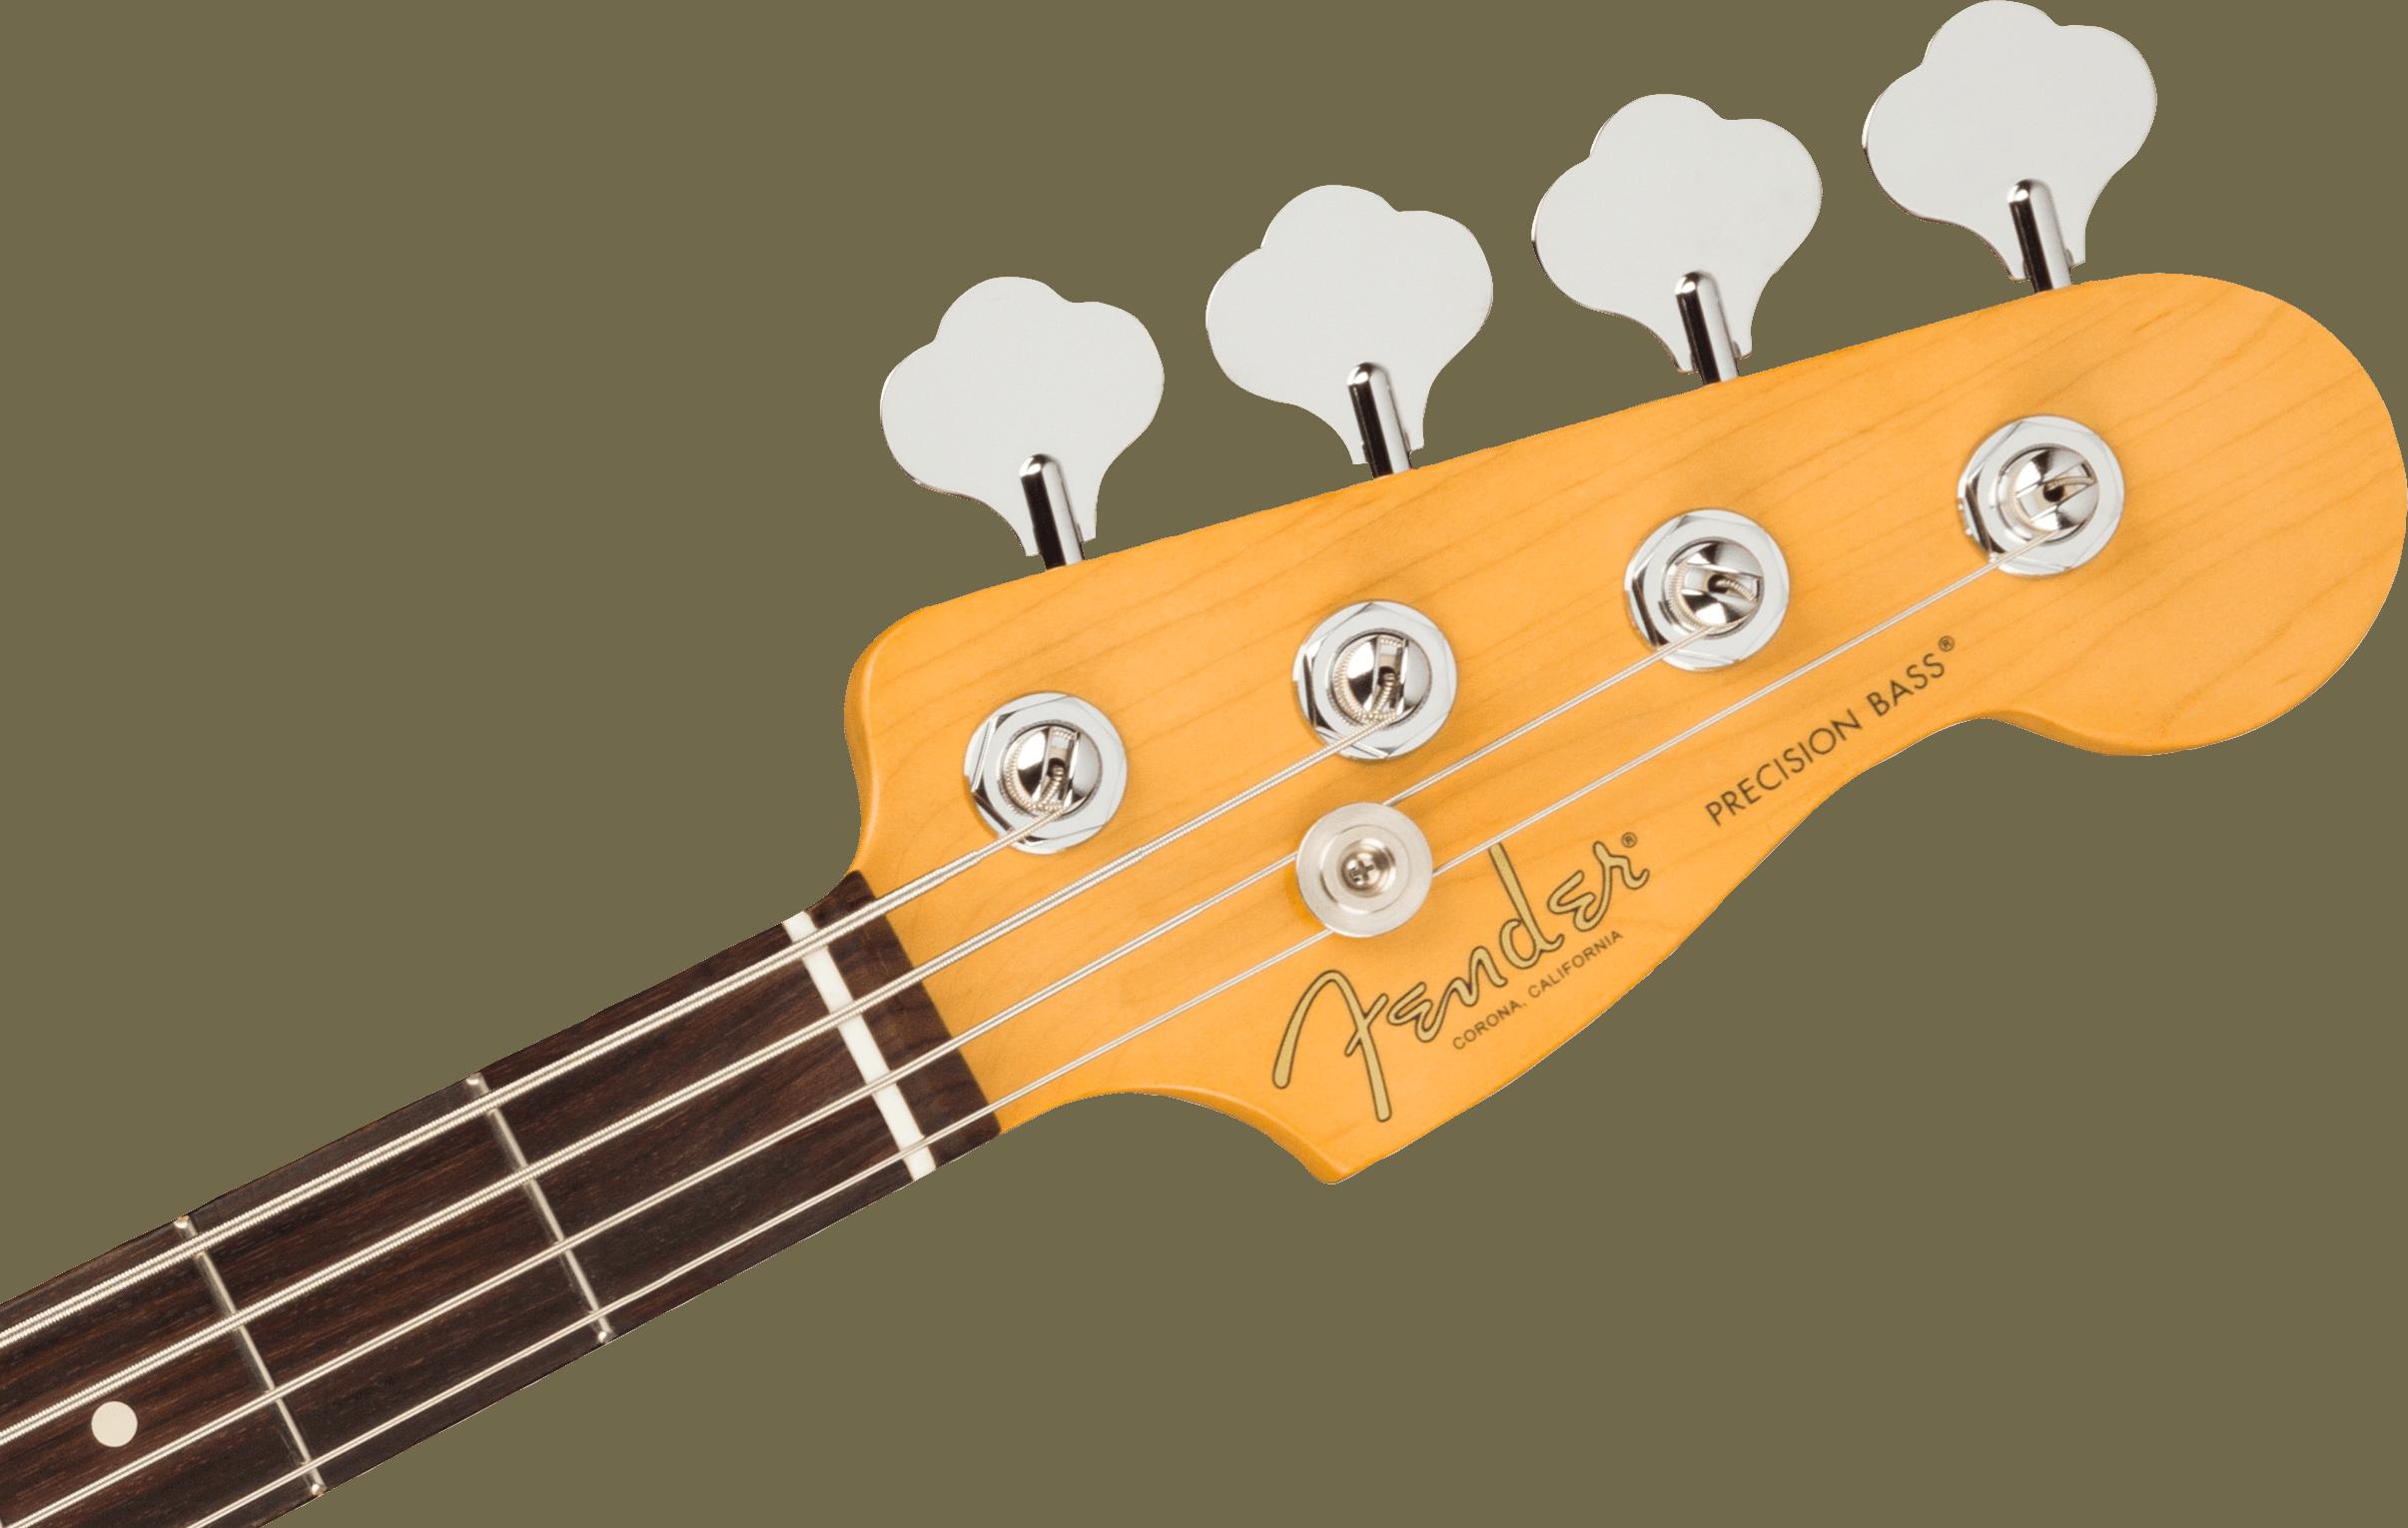 Fender American Professional II Precision Bass®, Rosewood Fingerboard, Mystic Surf Green